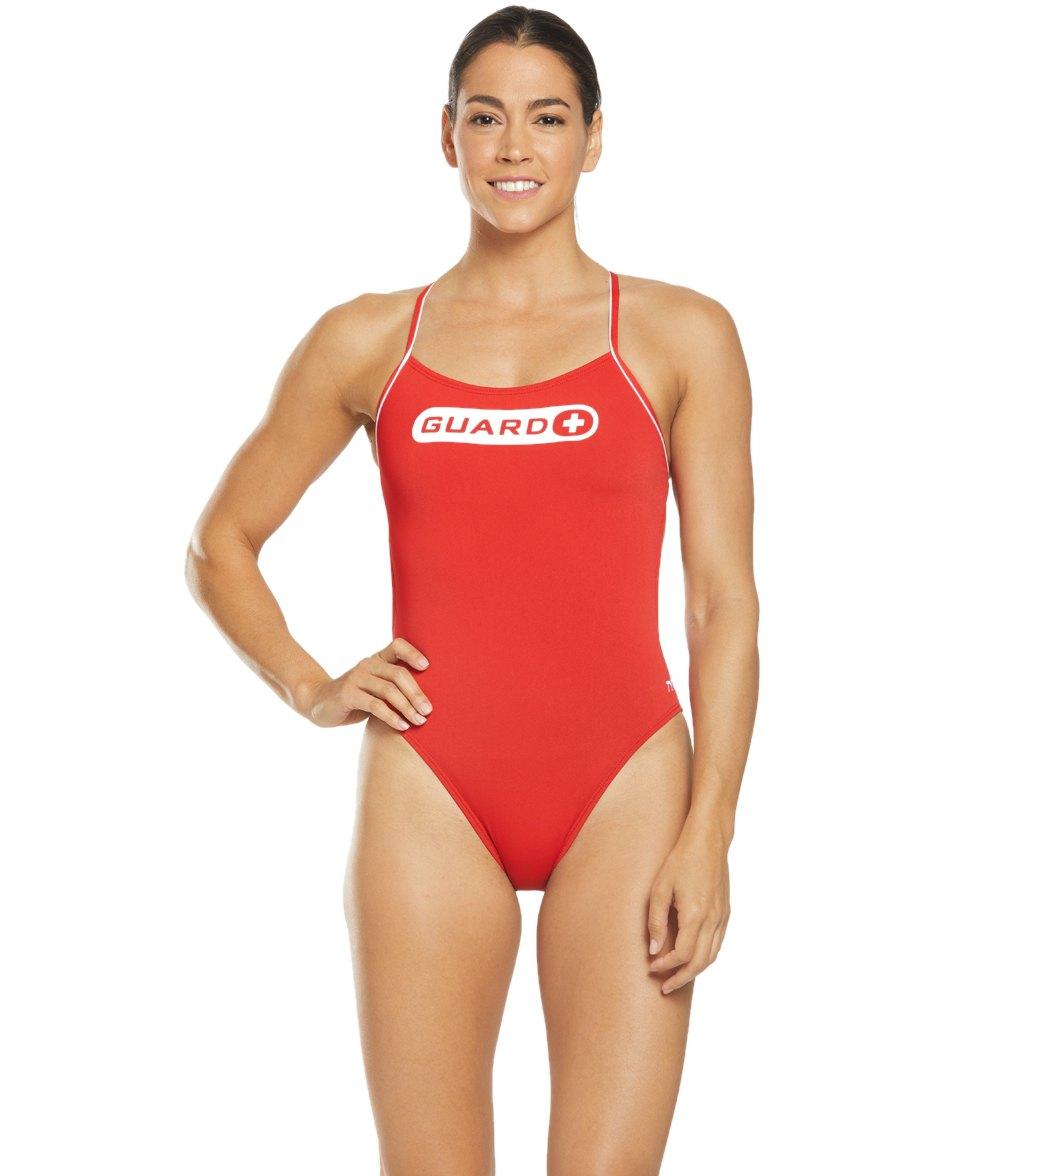 194d9da55b3e1 TYR Women's Guard Cutoutfit One Piece Swimsuit at SwimOutlet.com - Free  Shipping